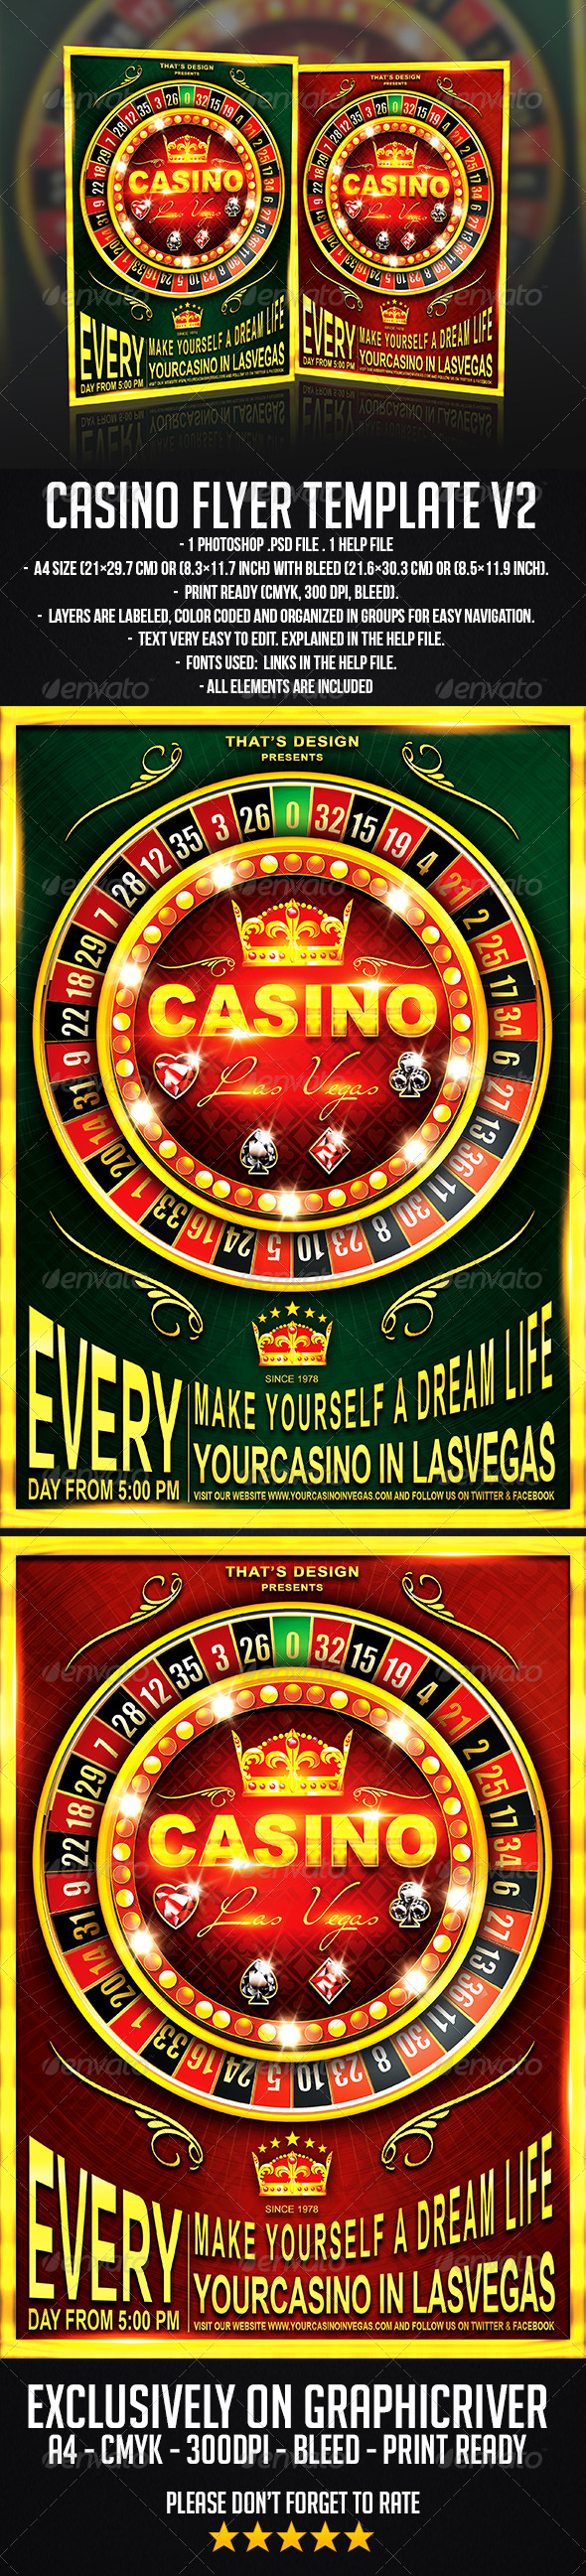 GraphicRiver Casino Flyer Template V2 6814001